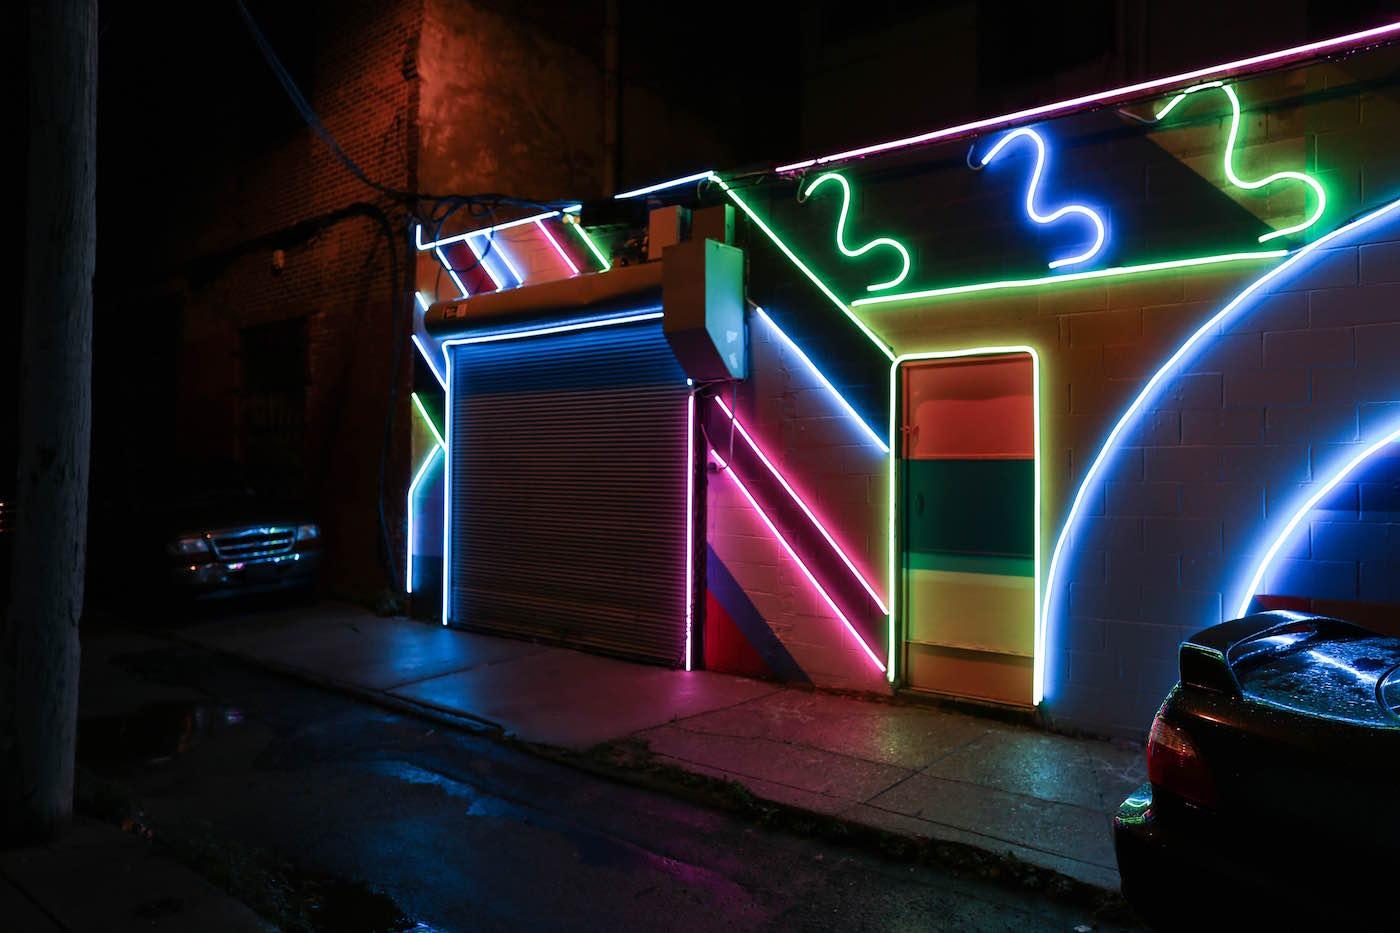 Led Street Art Lights Up A Dark Dodgy Alley In Philadelphia